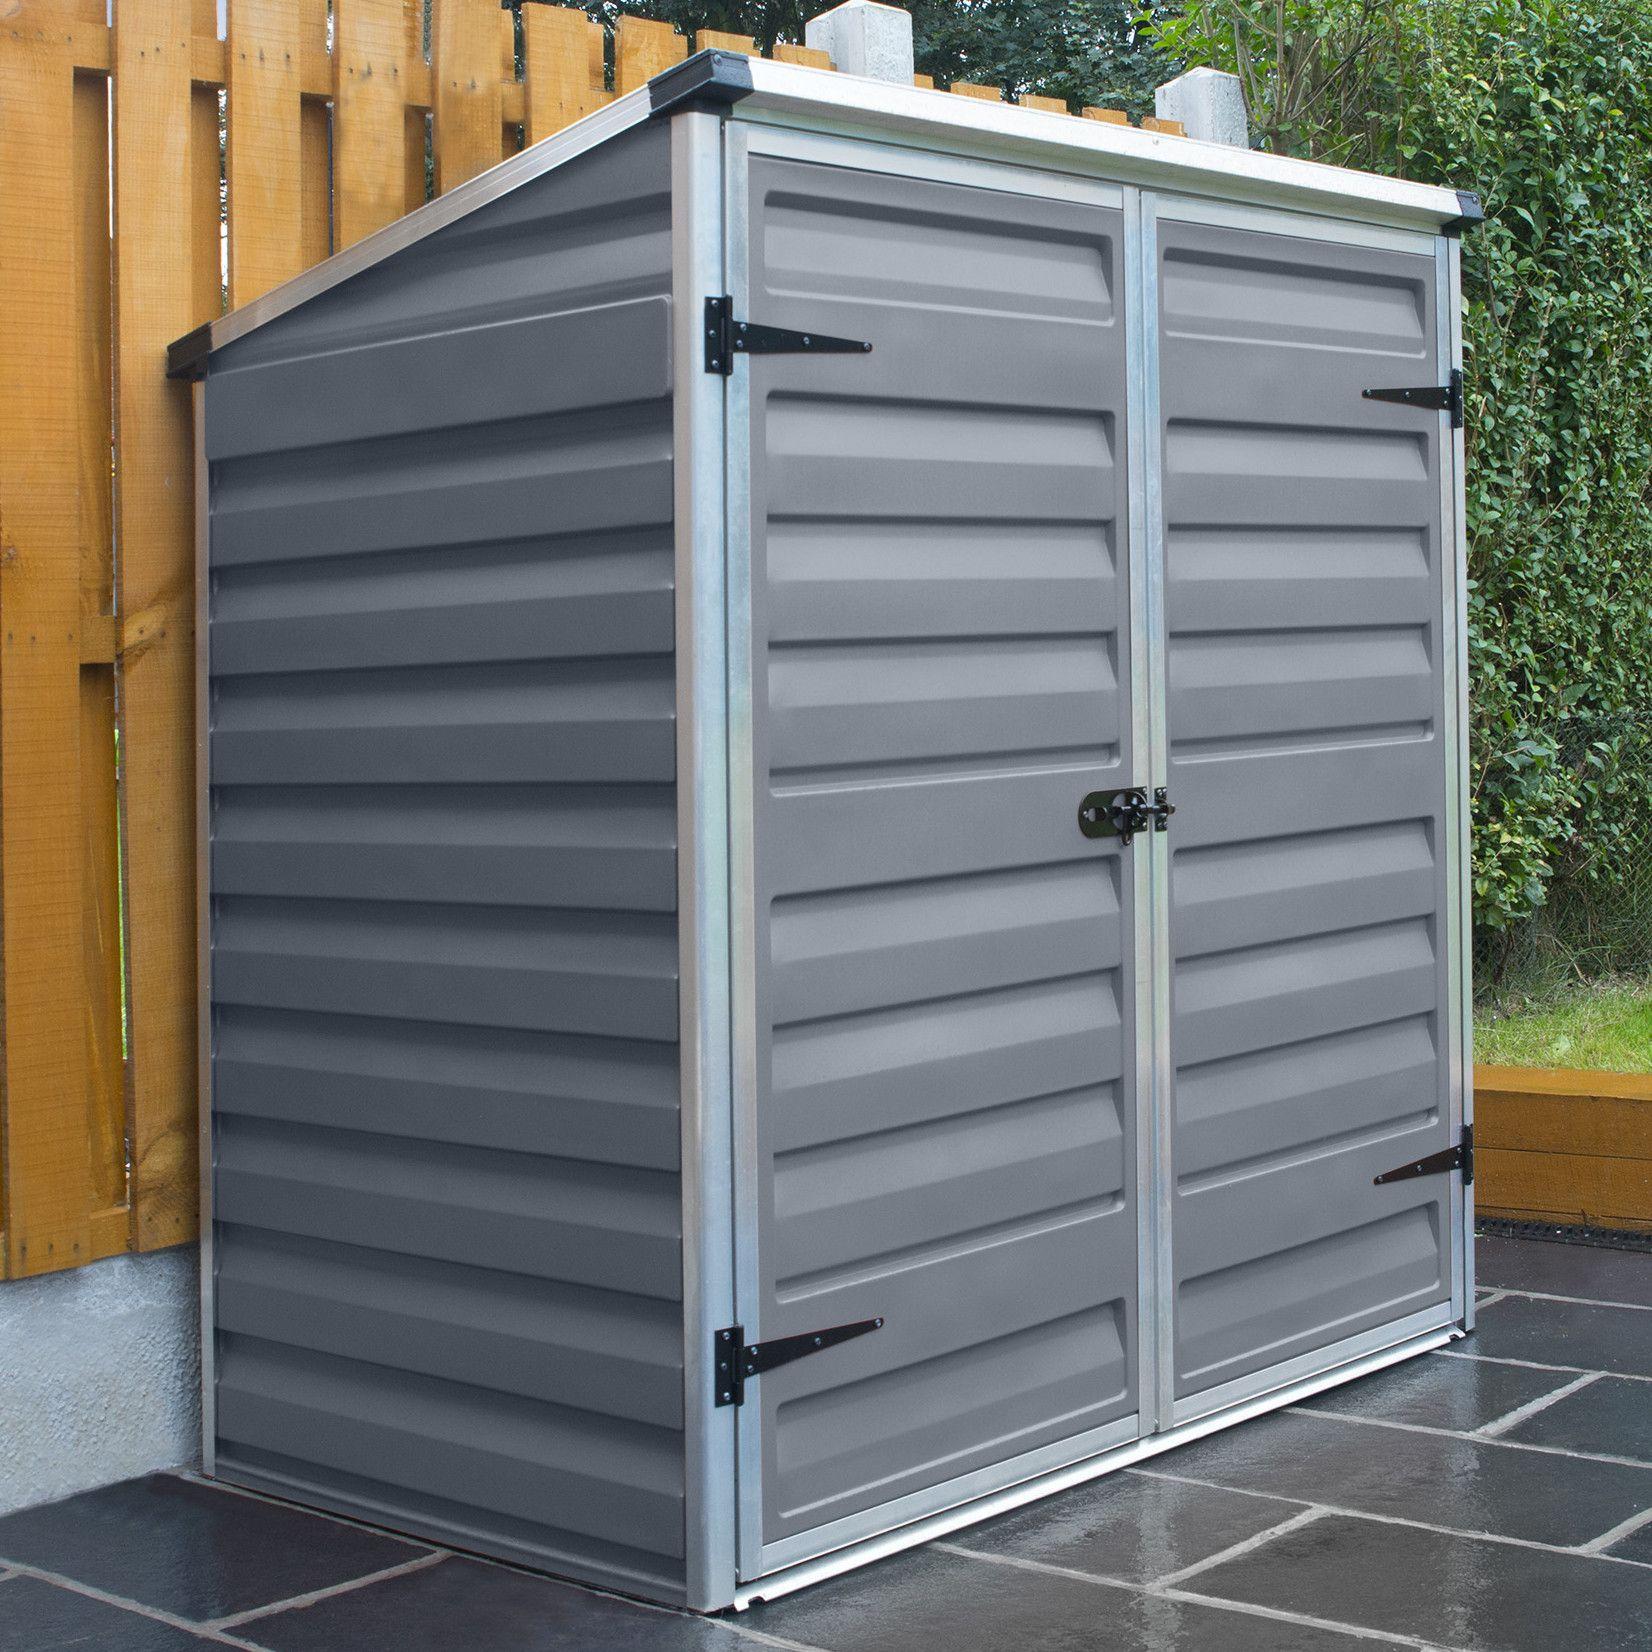 palram skylight voyager 1 x 2 polycarbonatealuminium storage shed wayfair uk - Garden Sheds 2 X 2